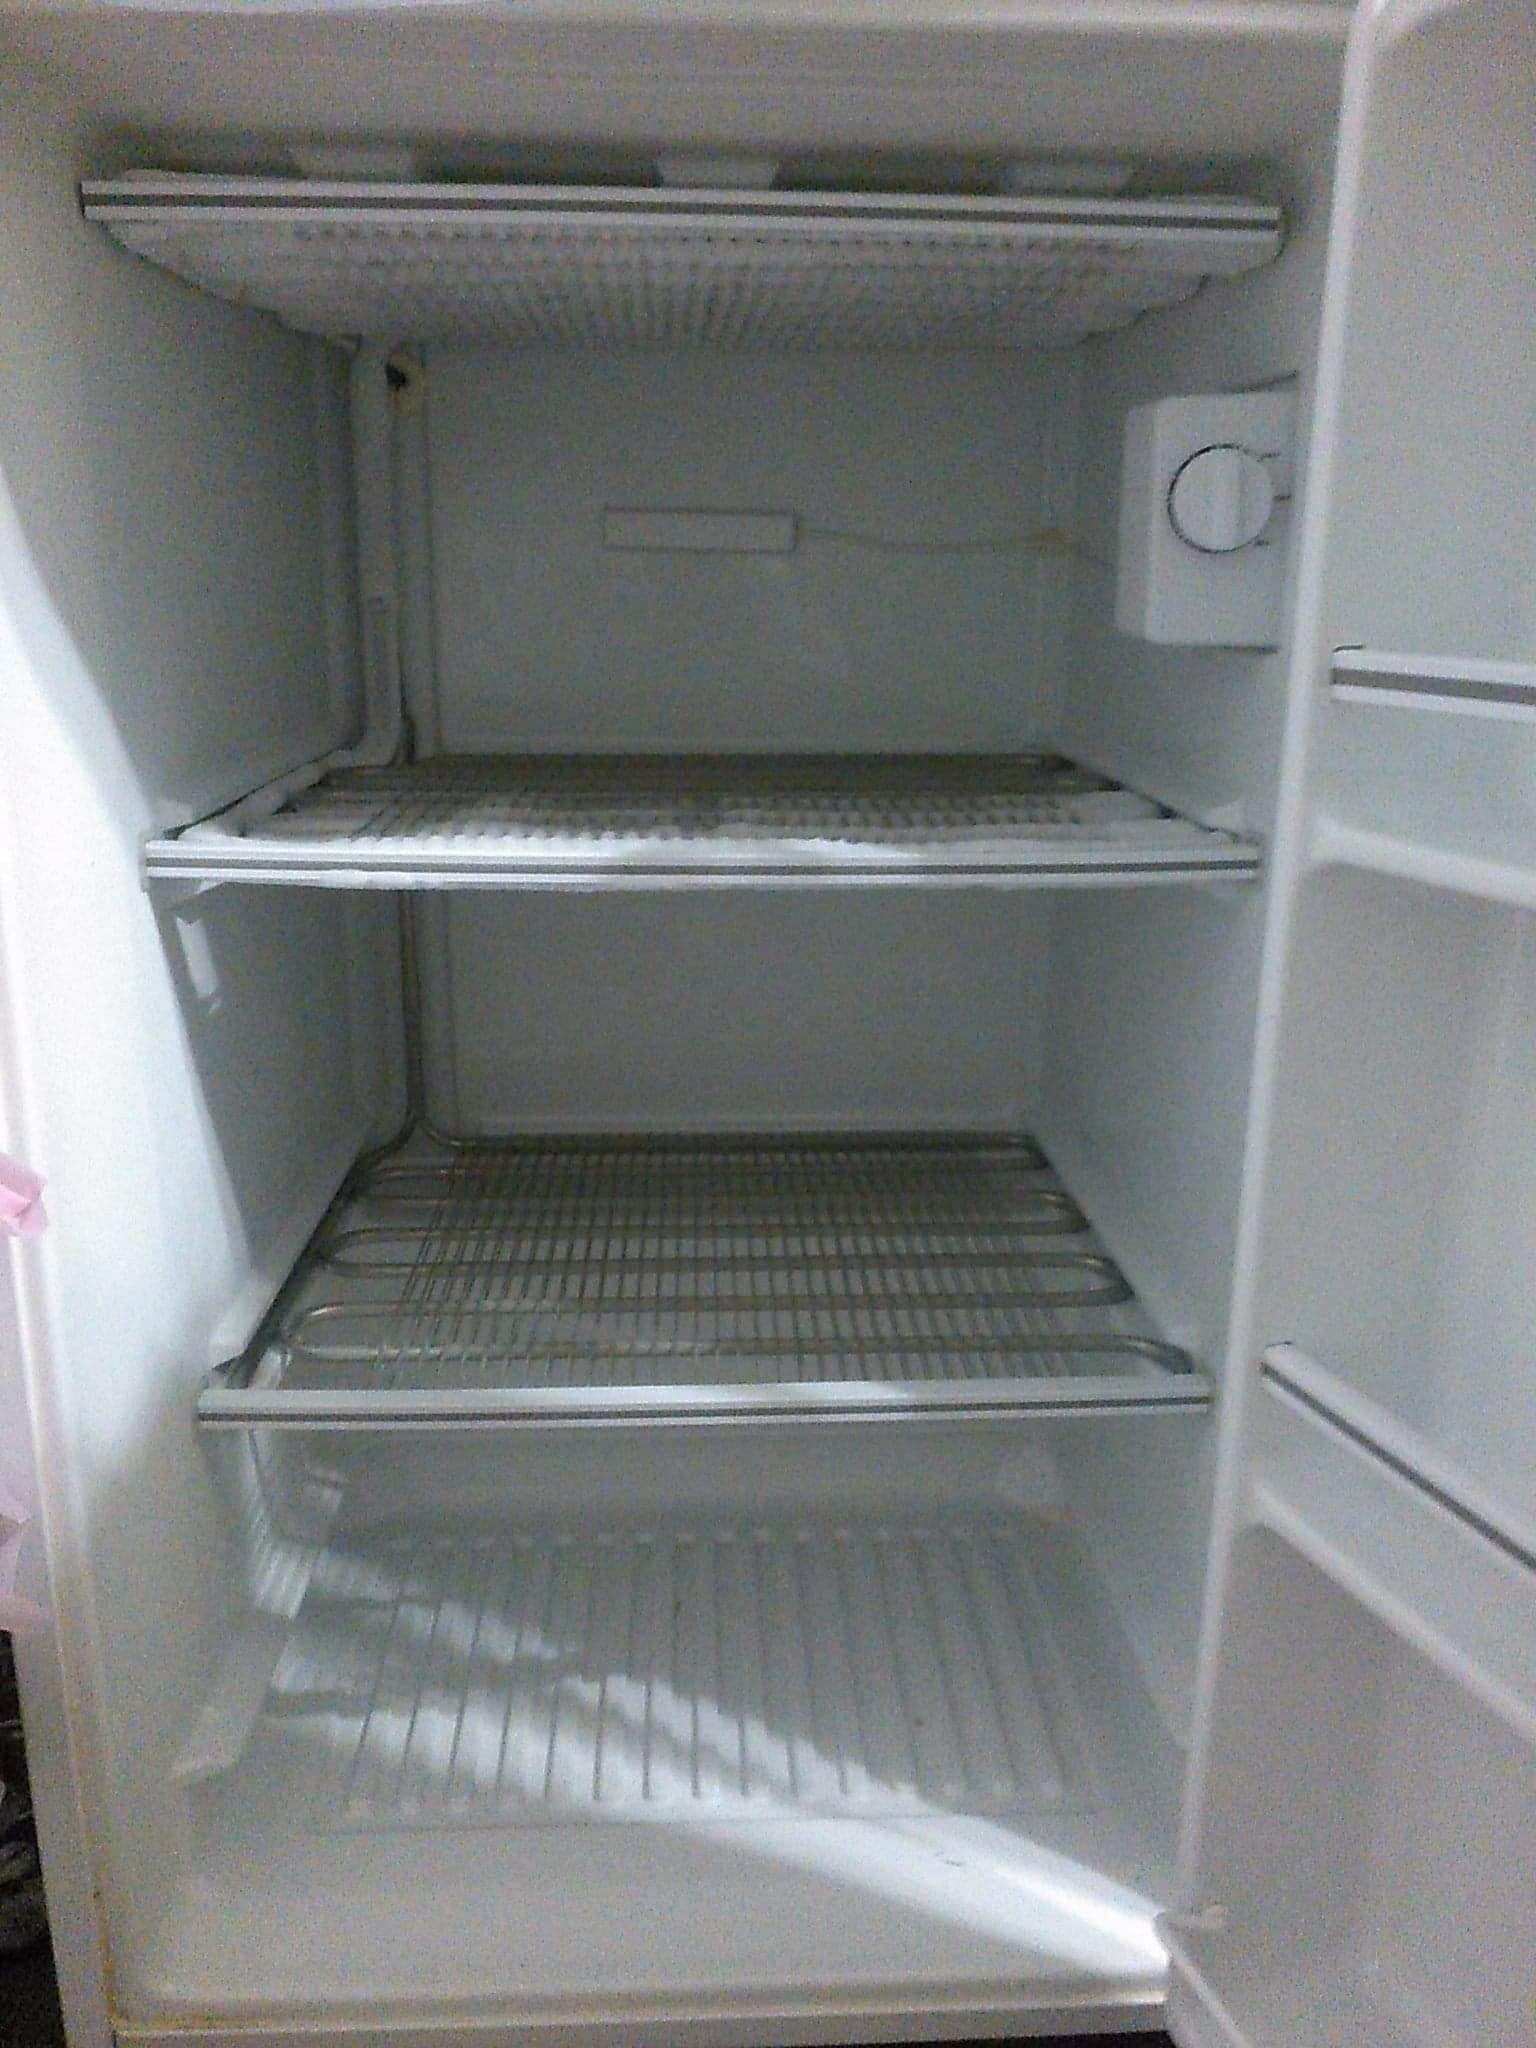 Kenmore freezer 56421501100